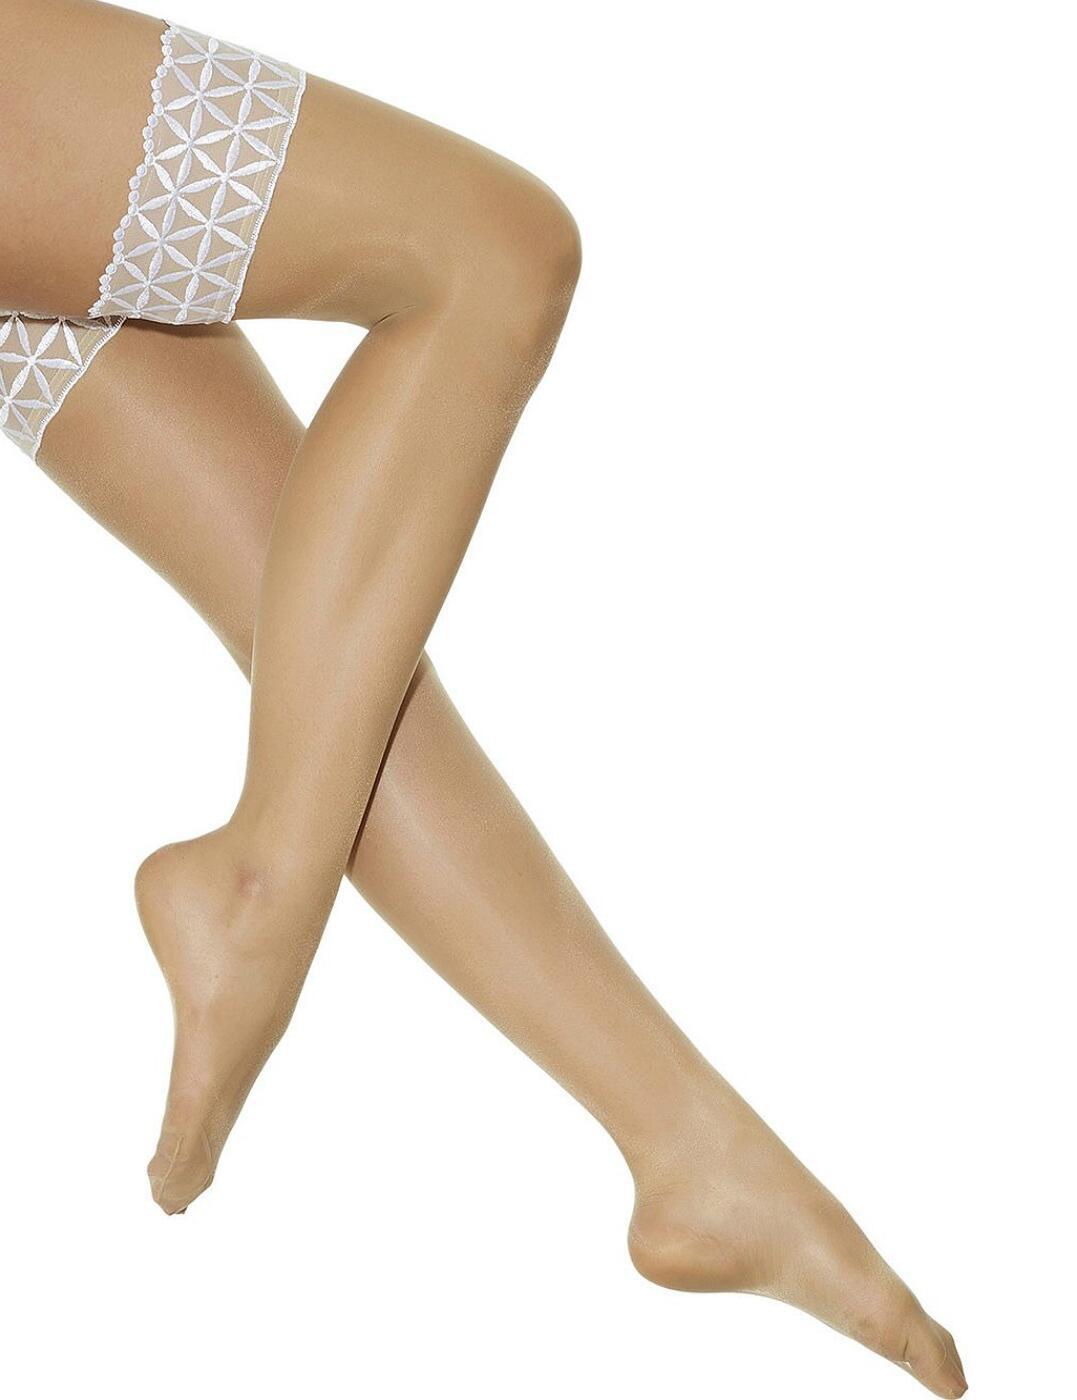 5098/703307 Aubade Bahia Stay Up Stockings - 5098/703307 Blanc